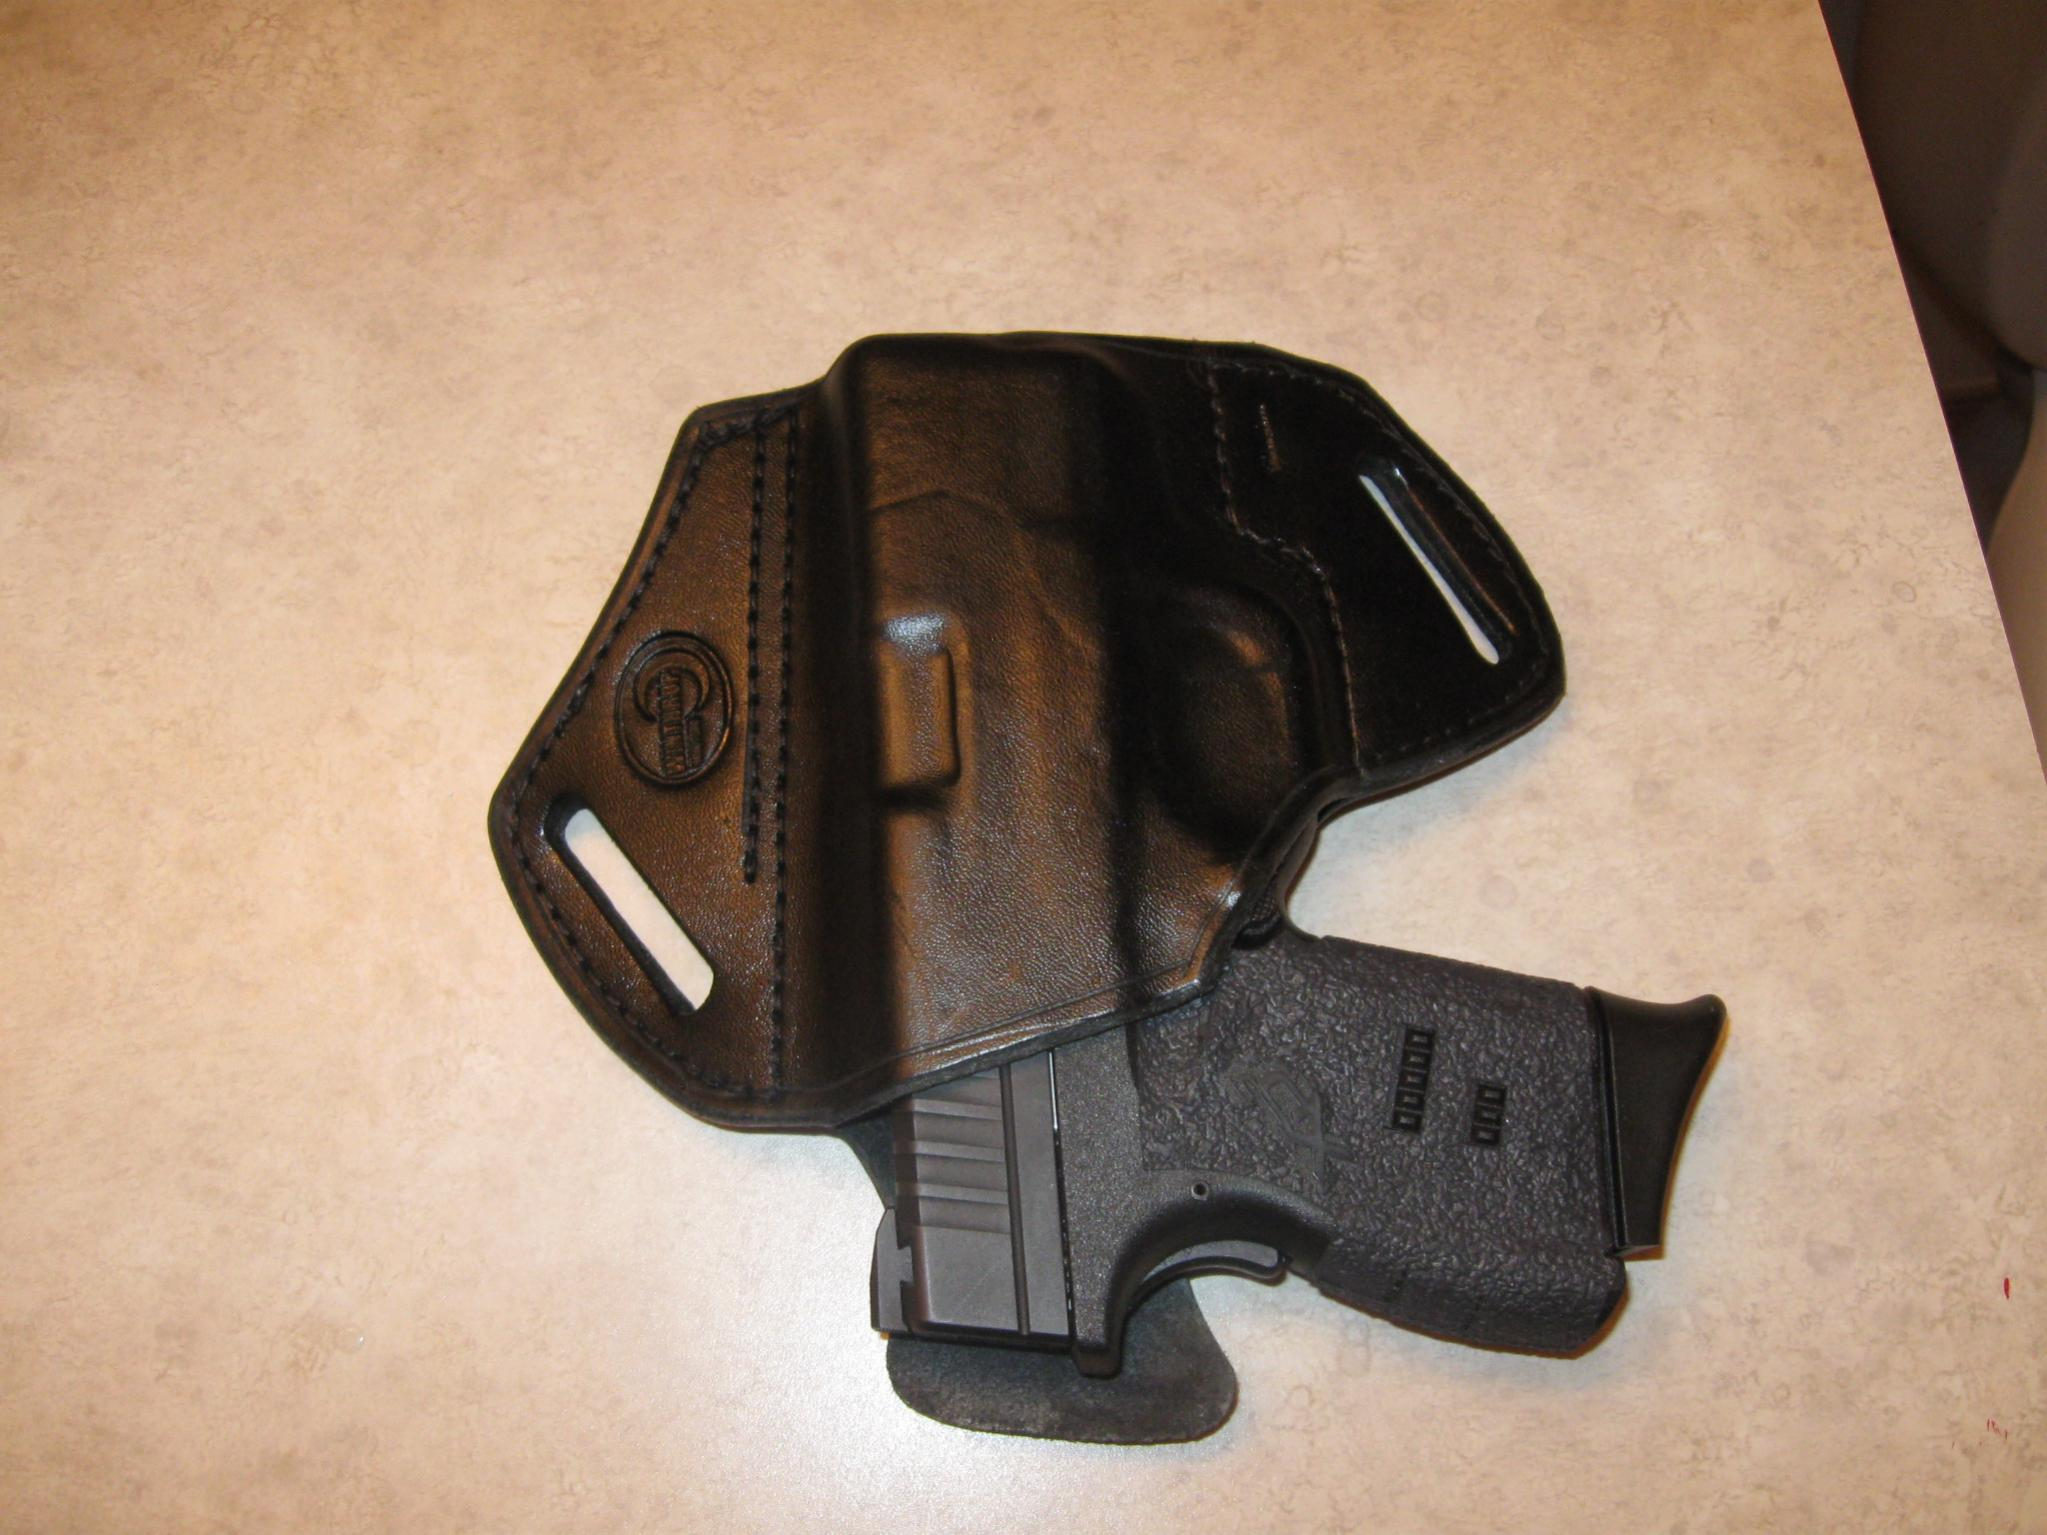 OWB Concealed Carry-owb-holsters-carry-001.jpg